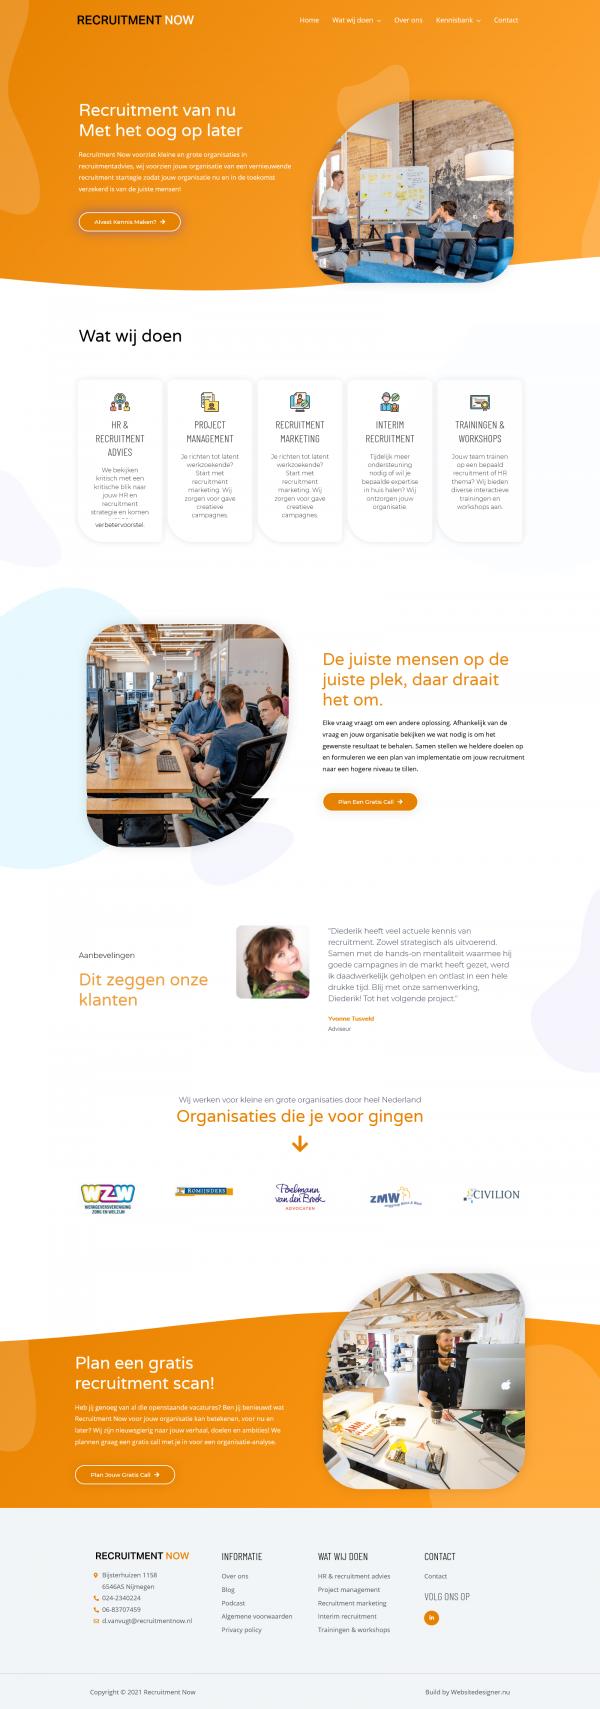 seo-specialist_Wageningen_Websitedesigner.nu_6.jpg